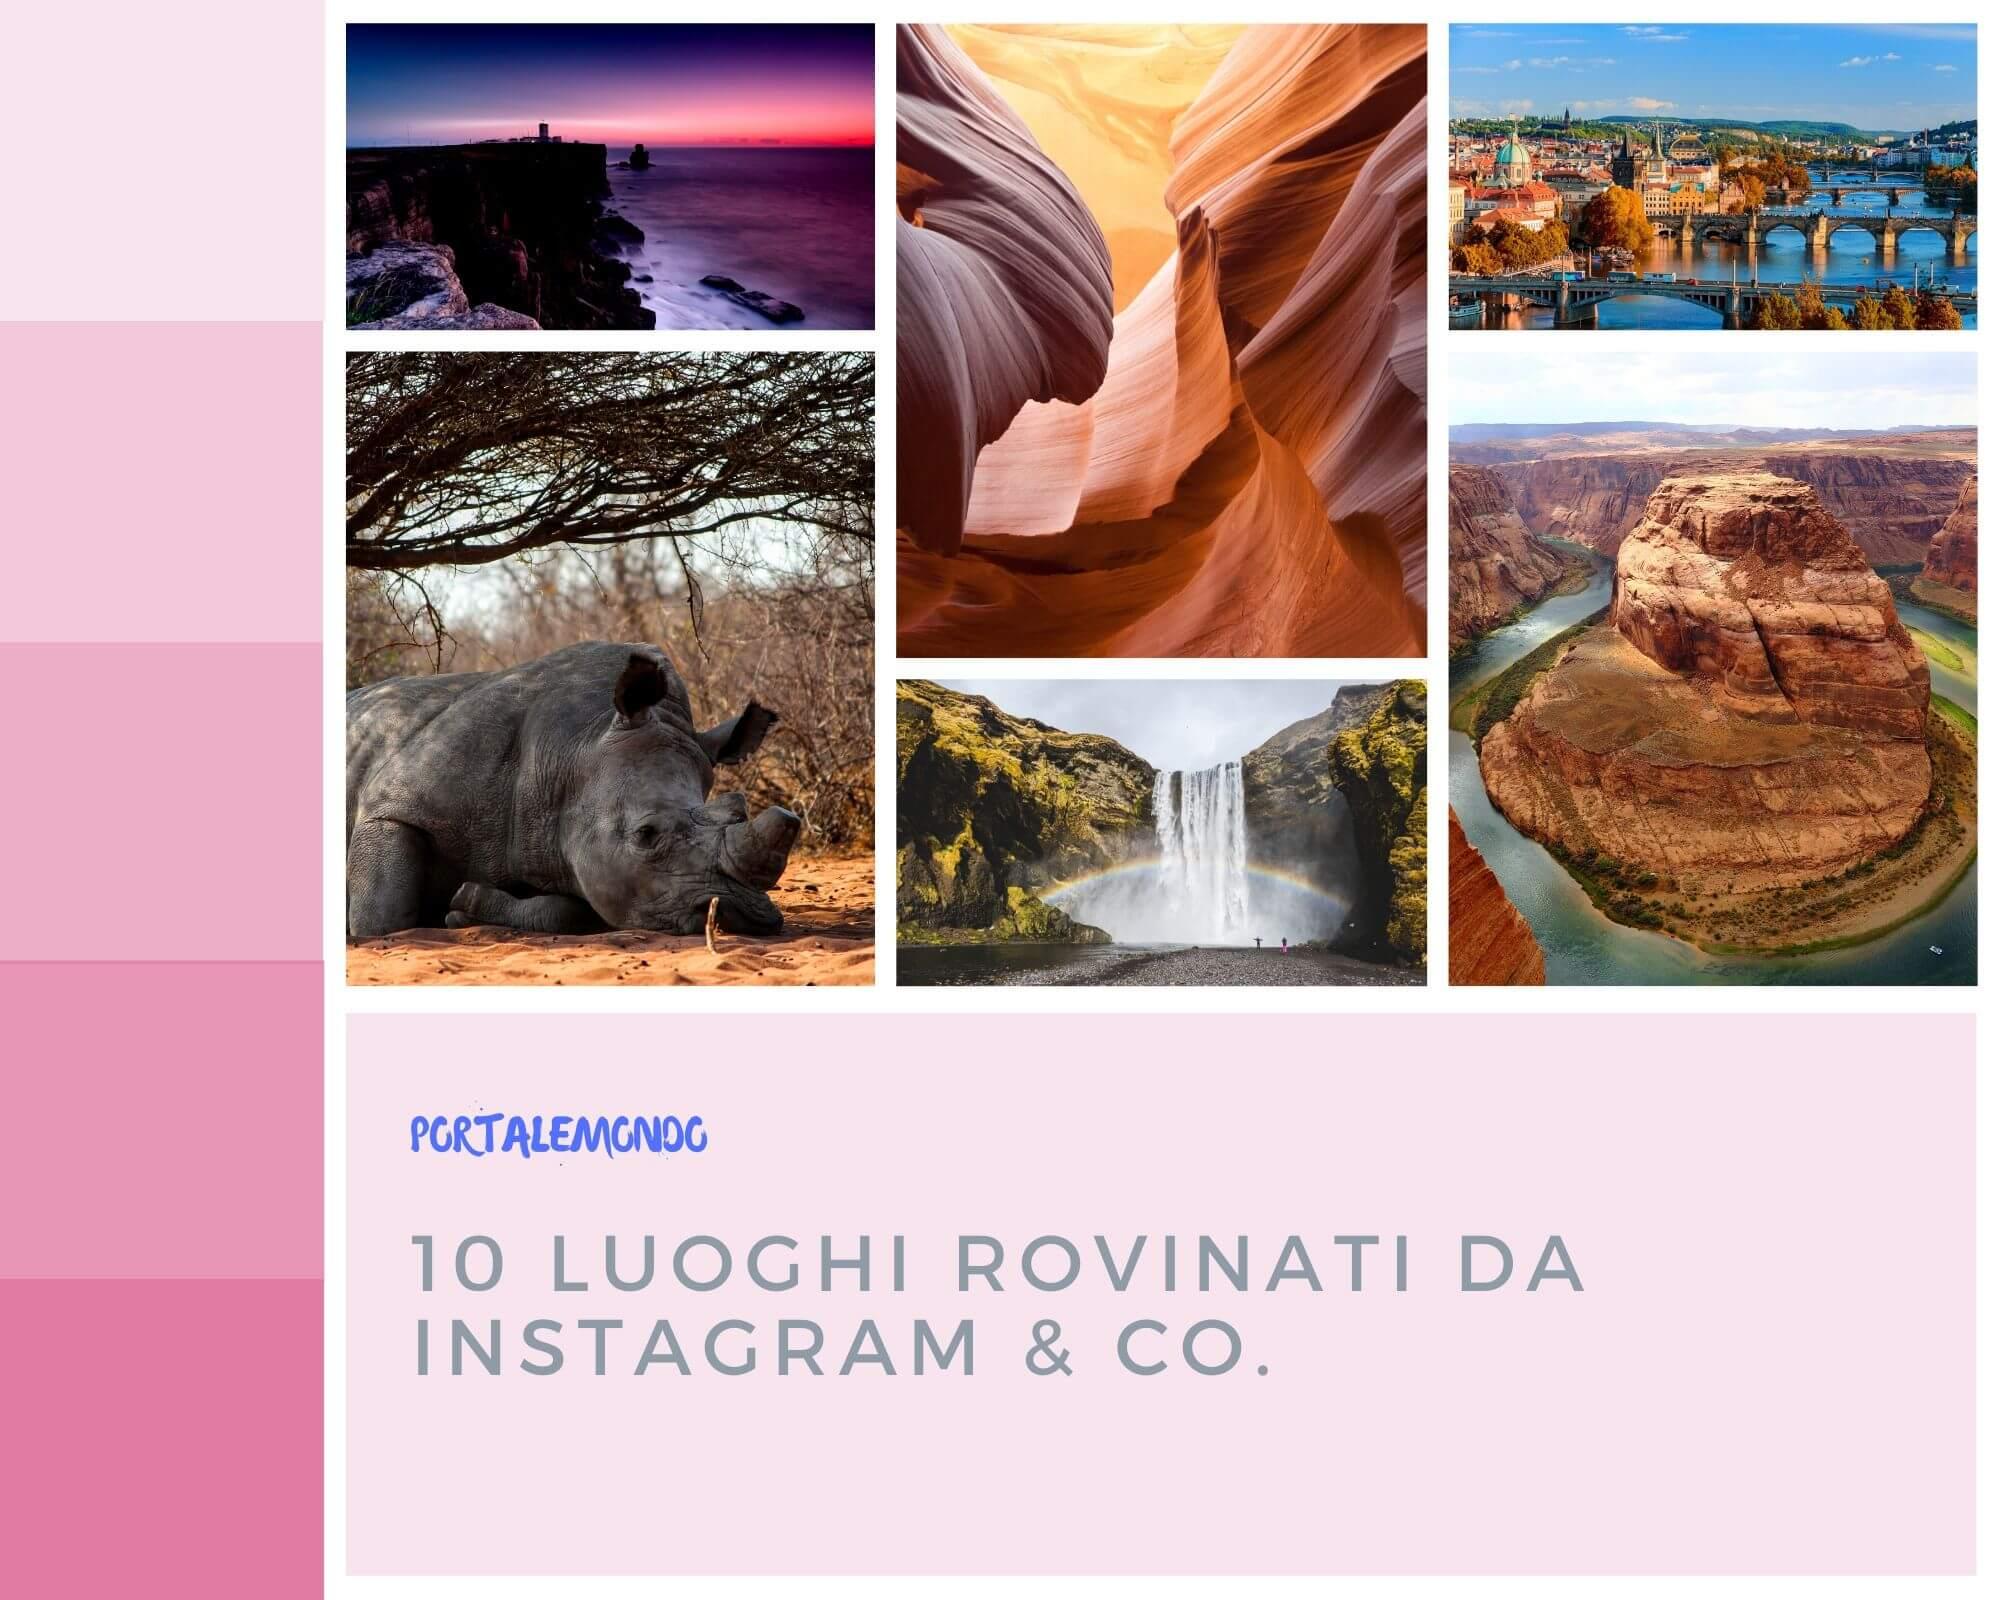 10 Luoghi rovinati da Instagram & Co.